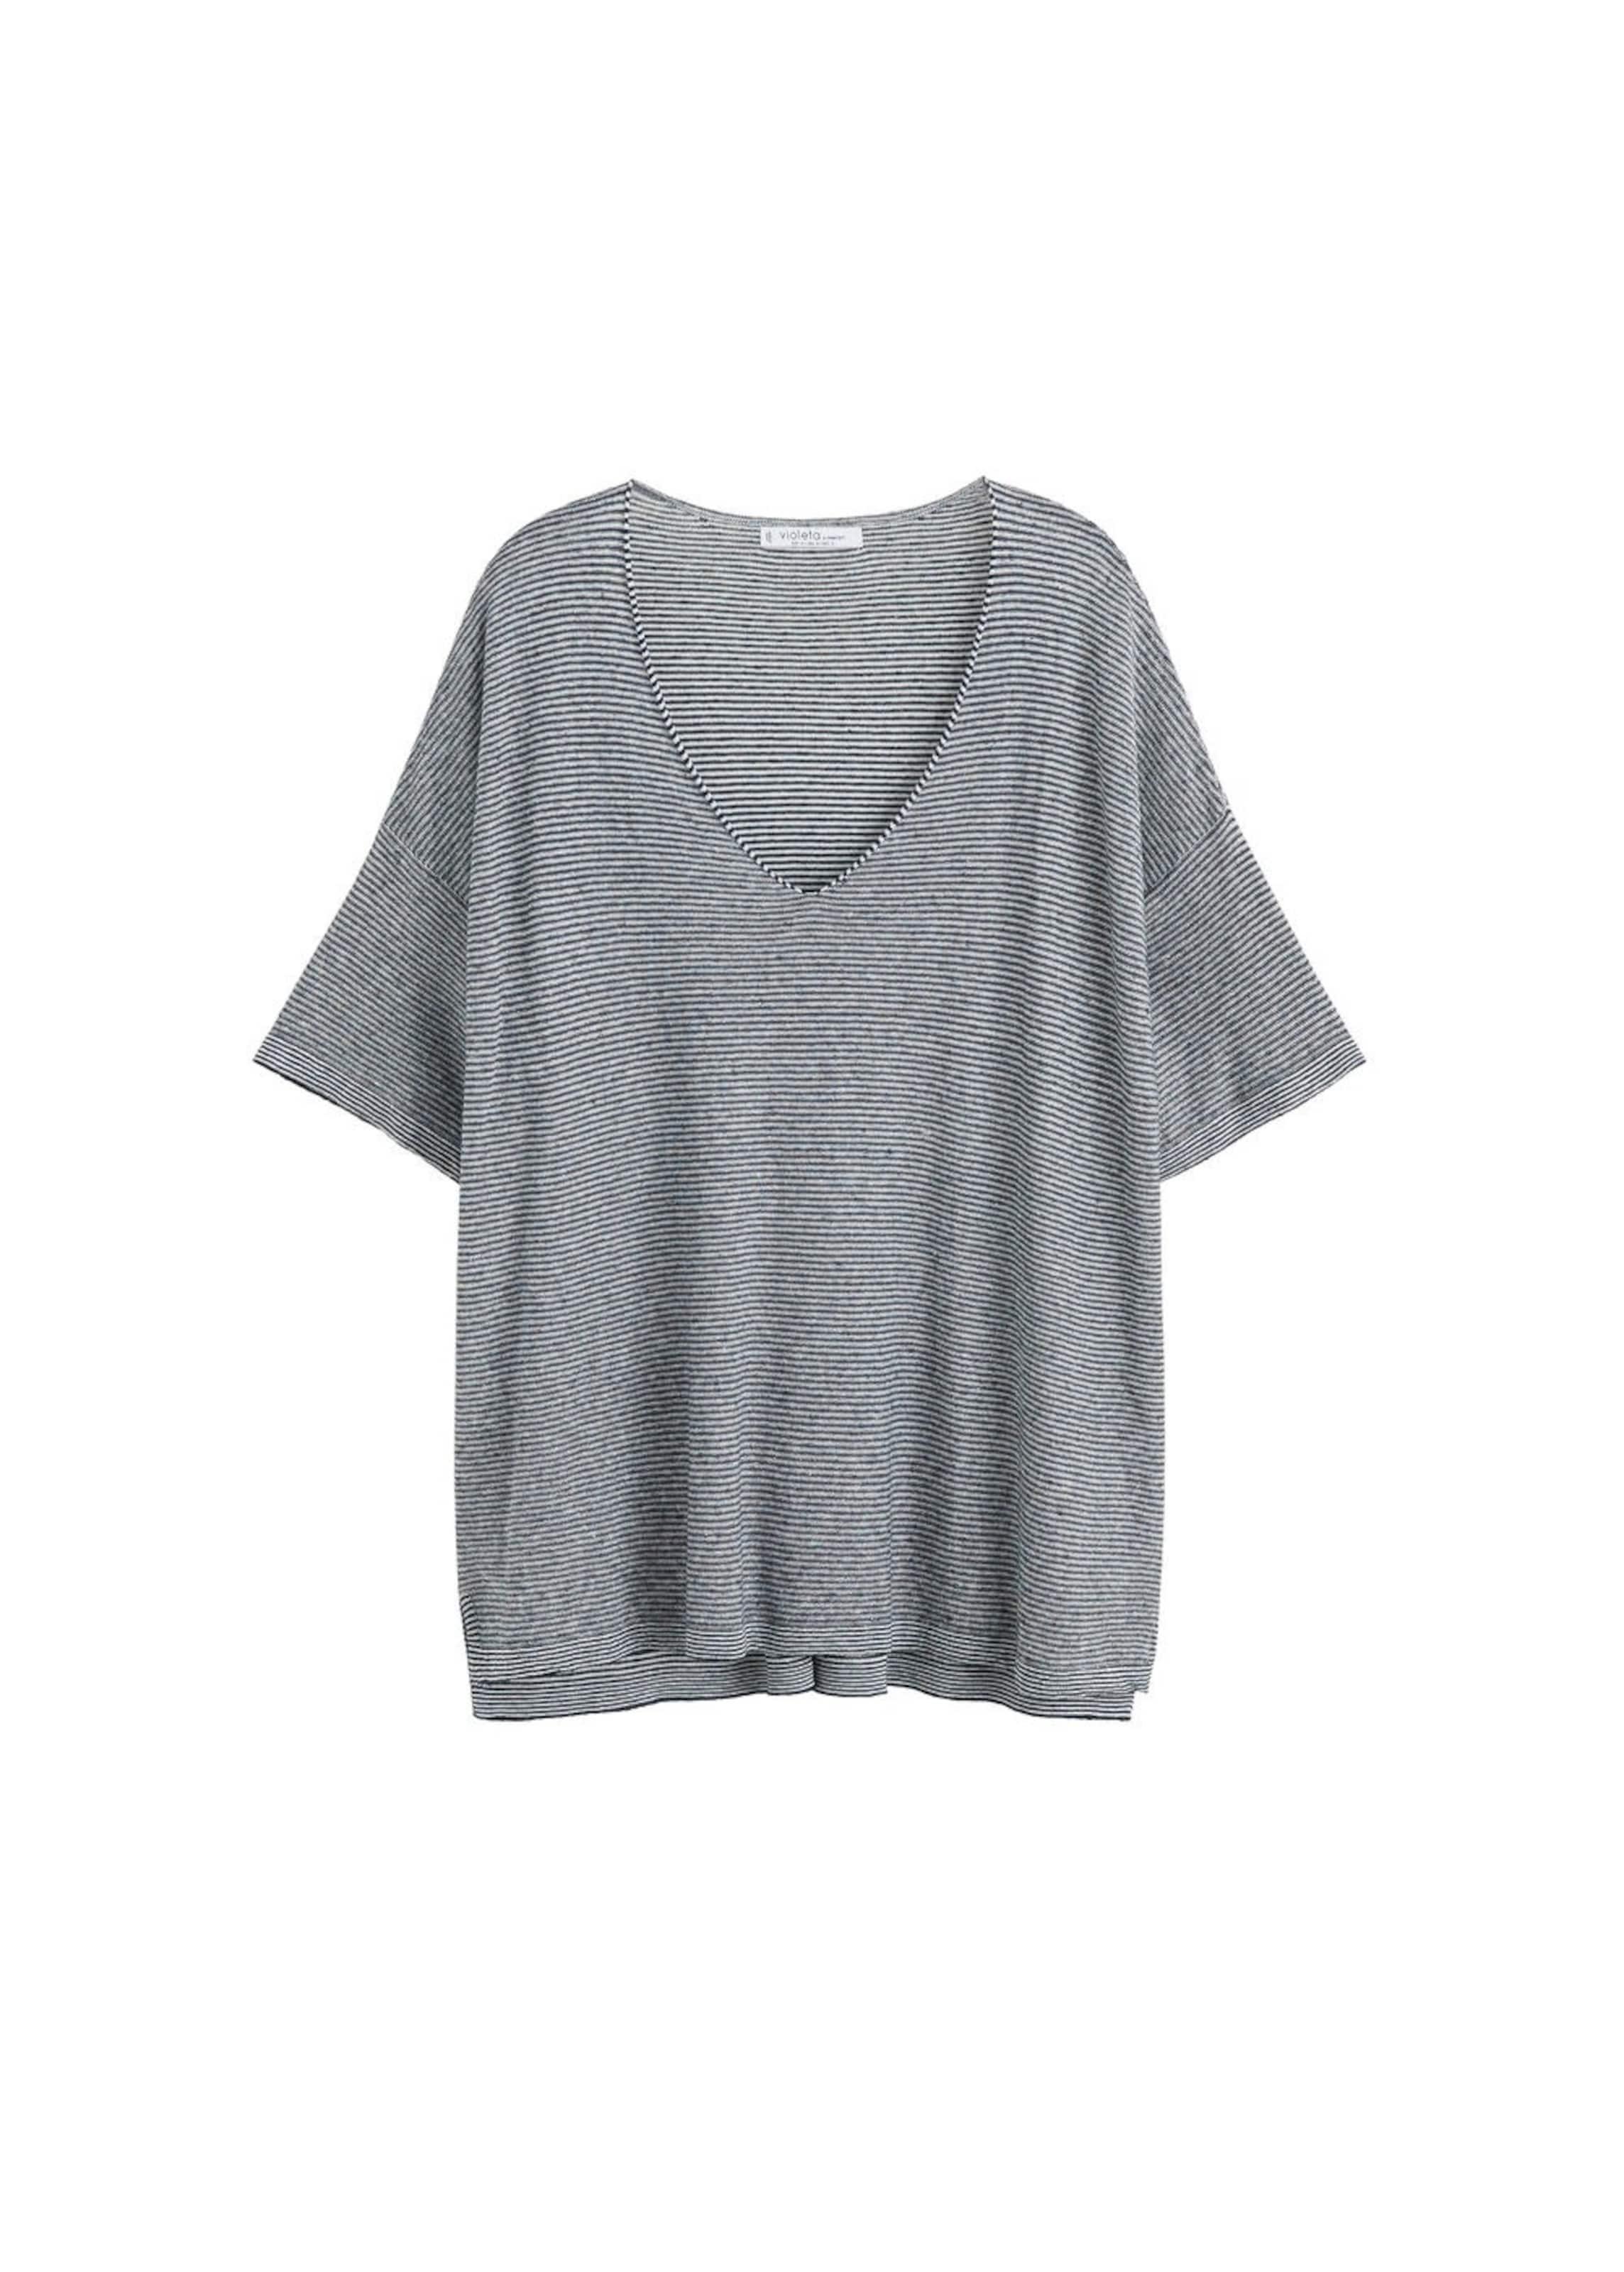 By Violeta In Shirt Mango 'misture2' Navy Ful1TKJc3